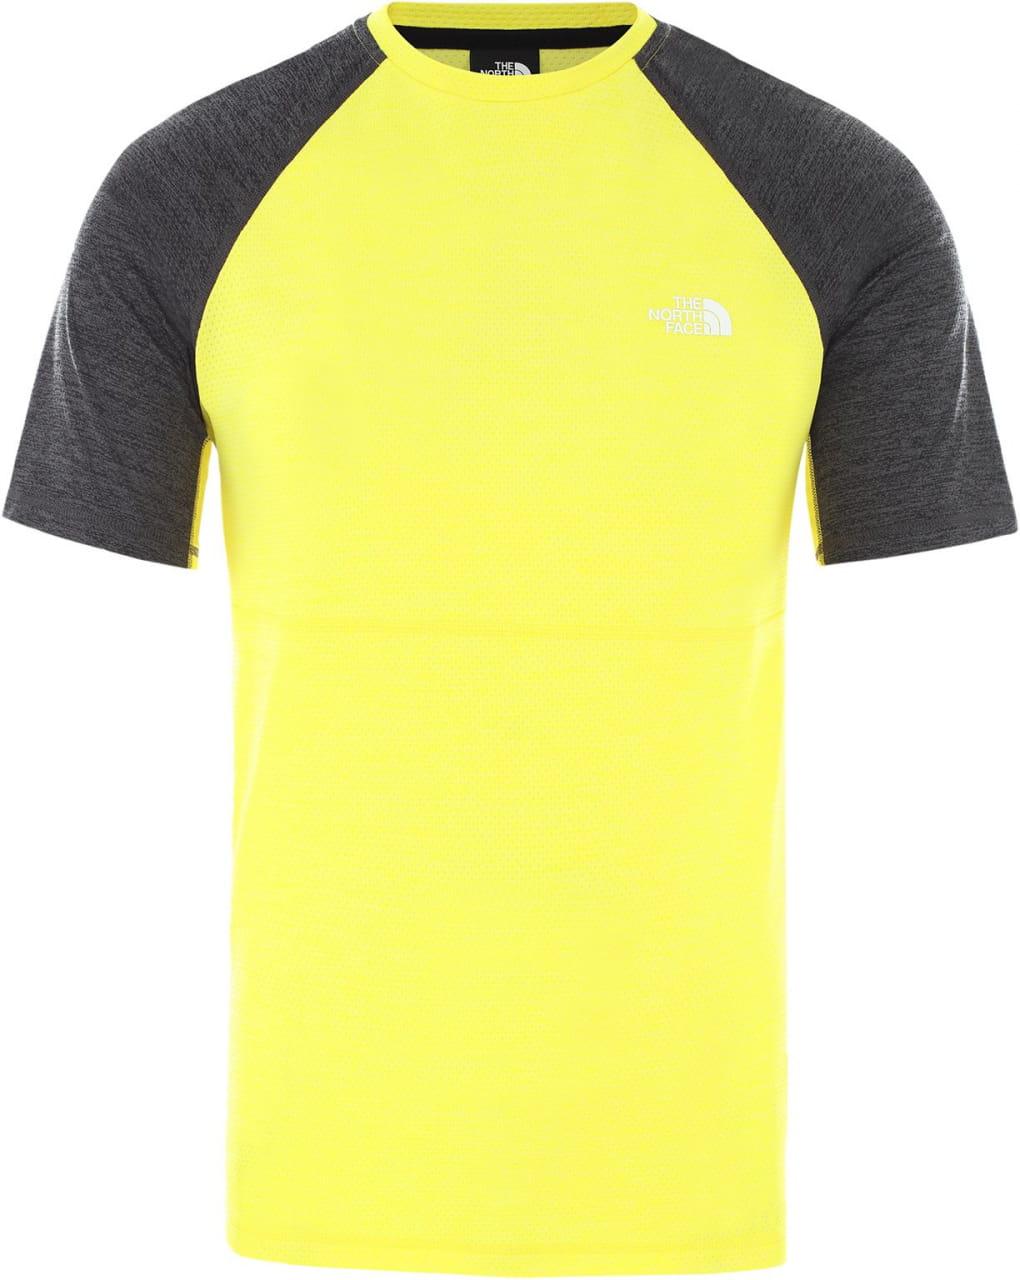 Pánské tričko The North Face Men's Varuna T-Shirt